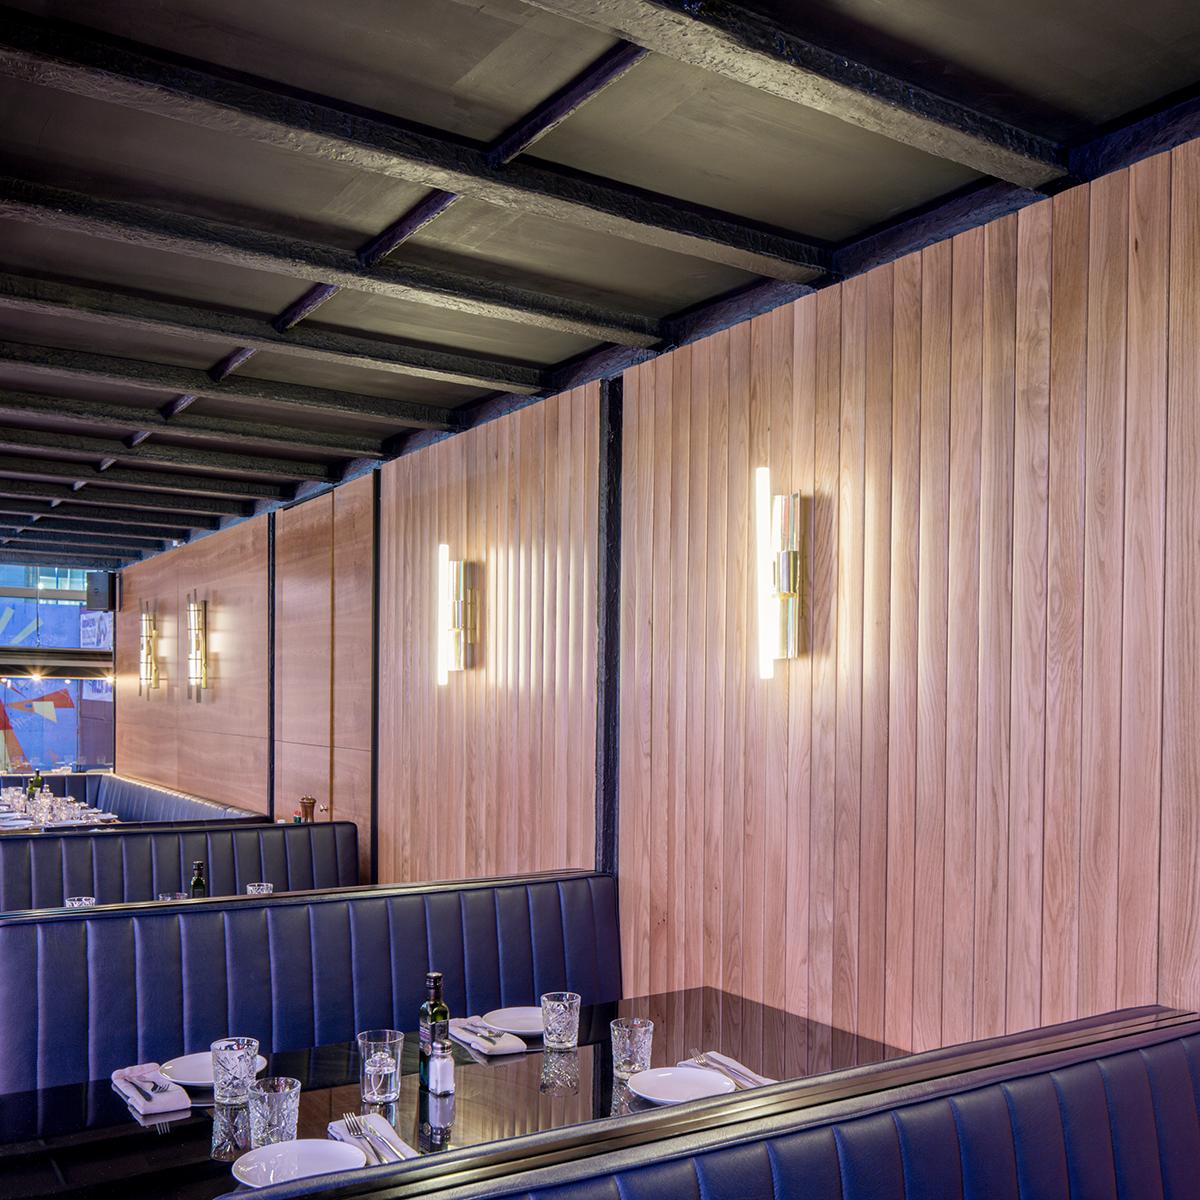 Restaurante El Mama | Pablo Peyra Studio